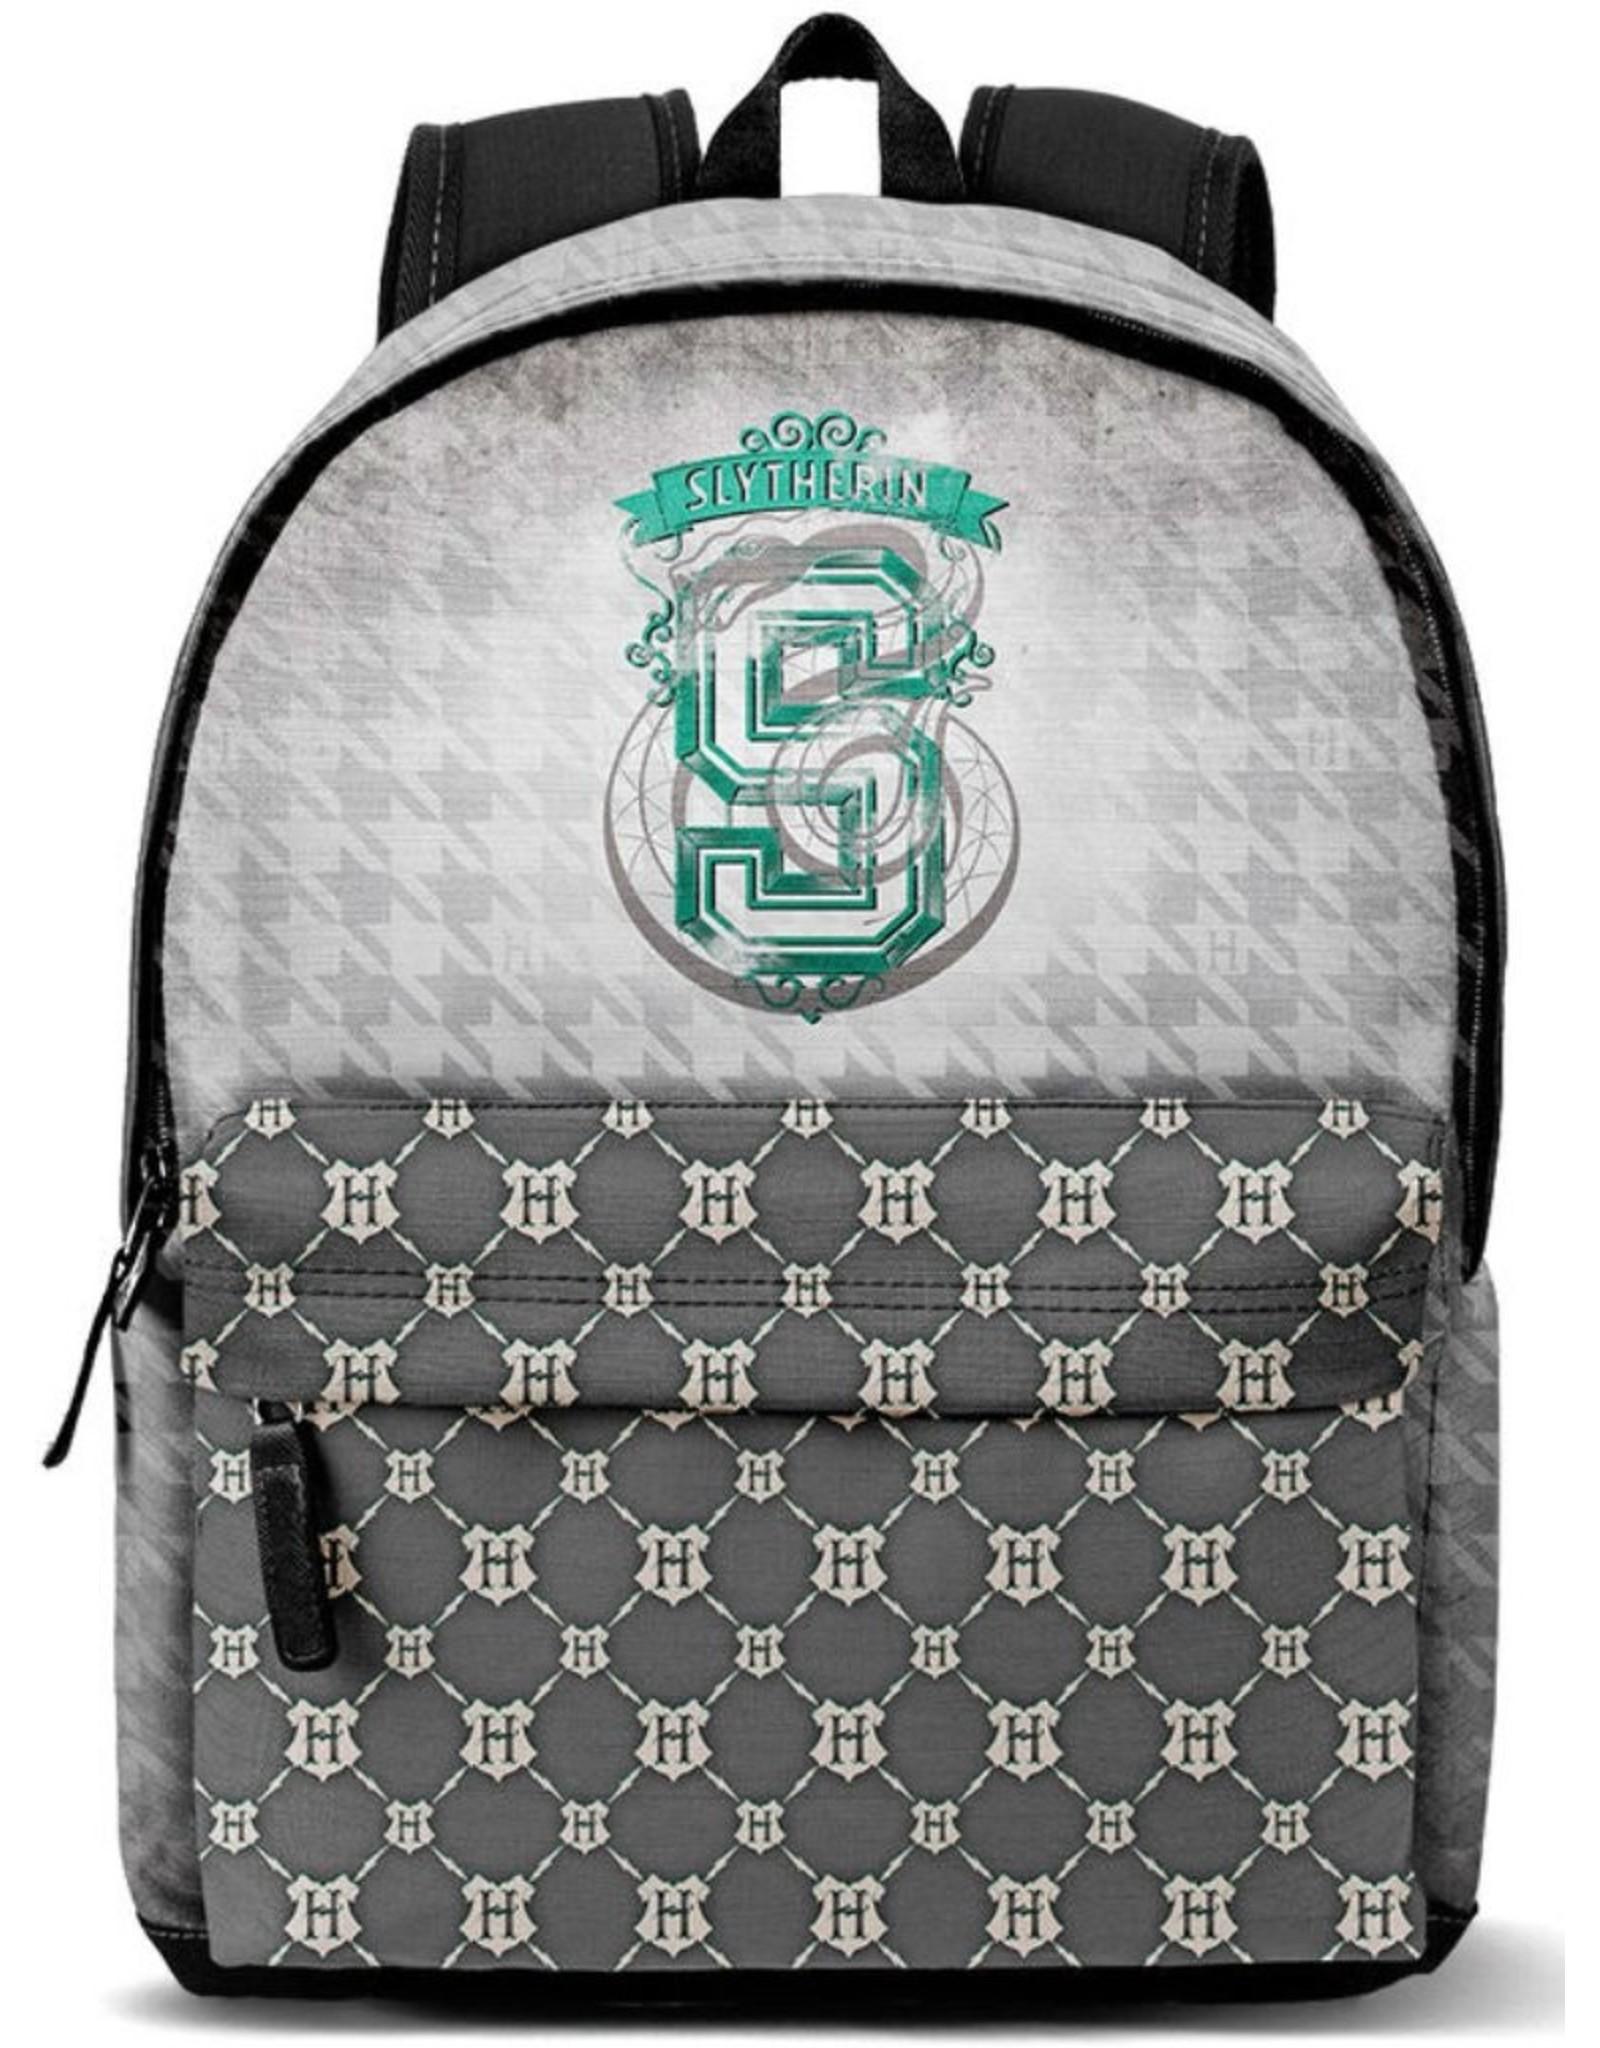 Harry Potter Harry Potter bags - Harry Potter Slytherin backpack 43cm